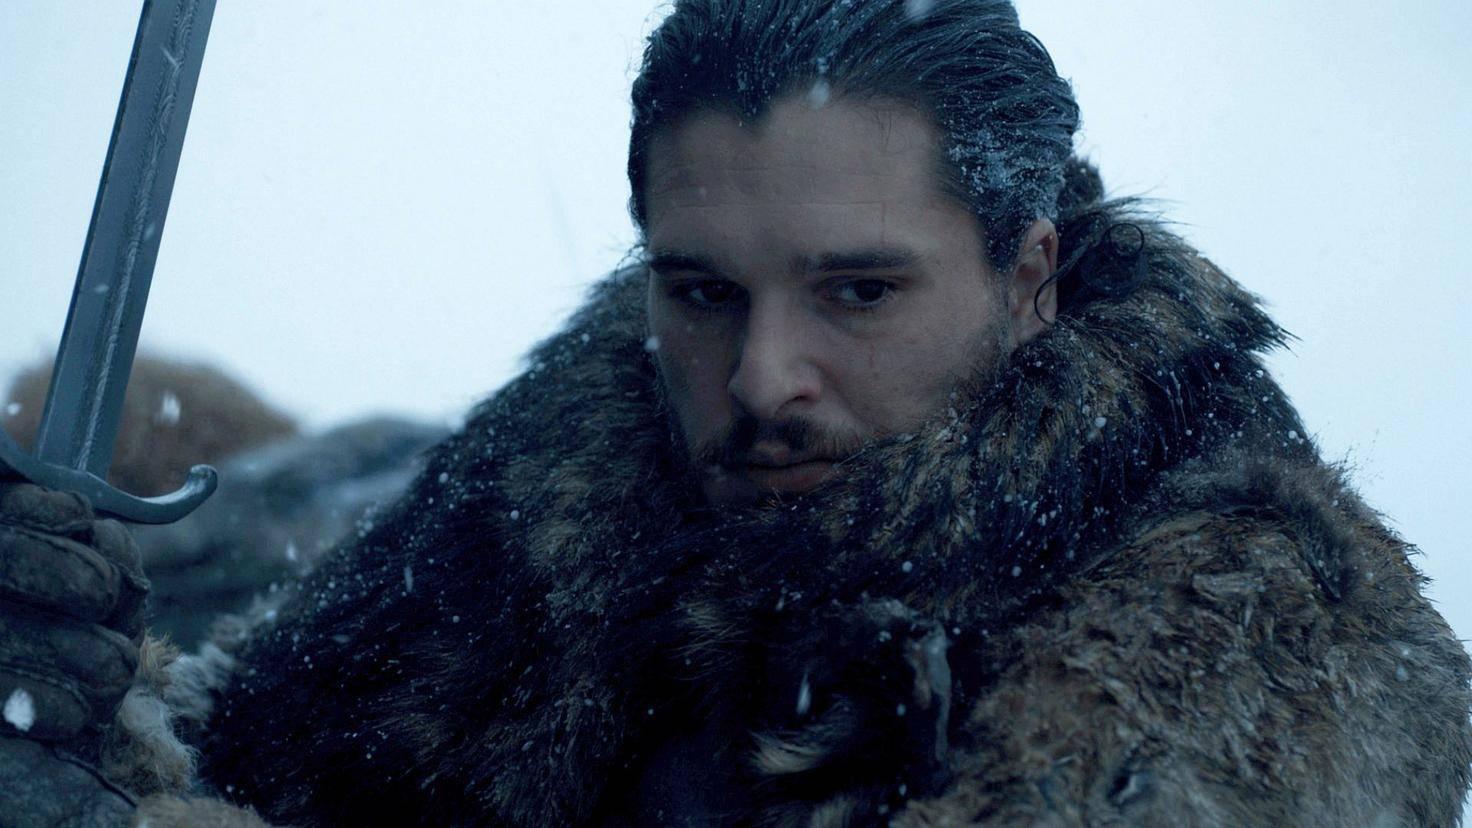 game-of-thrones-staffel-7-episode-6-jon-snow-2